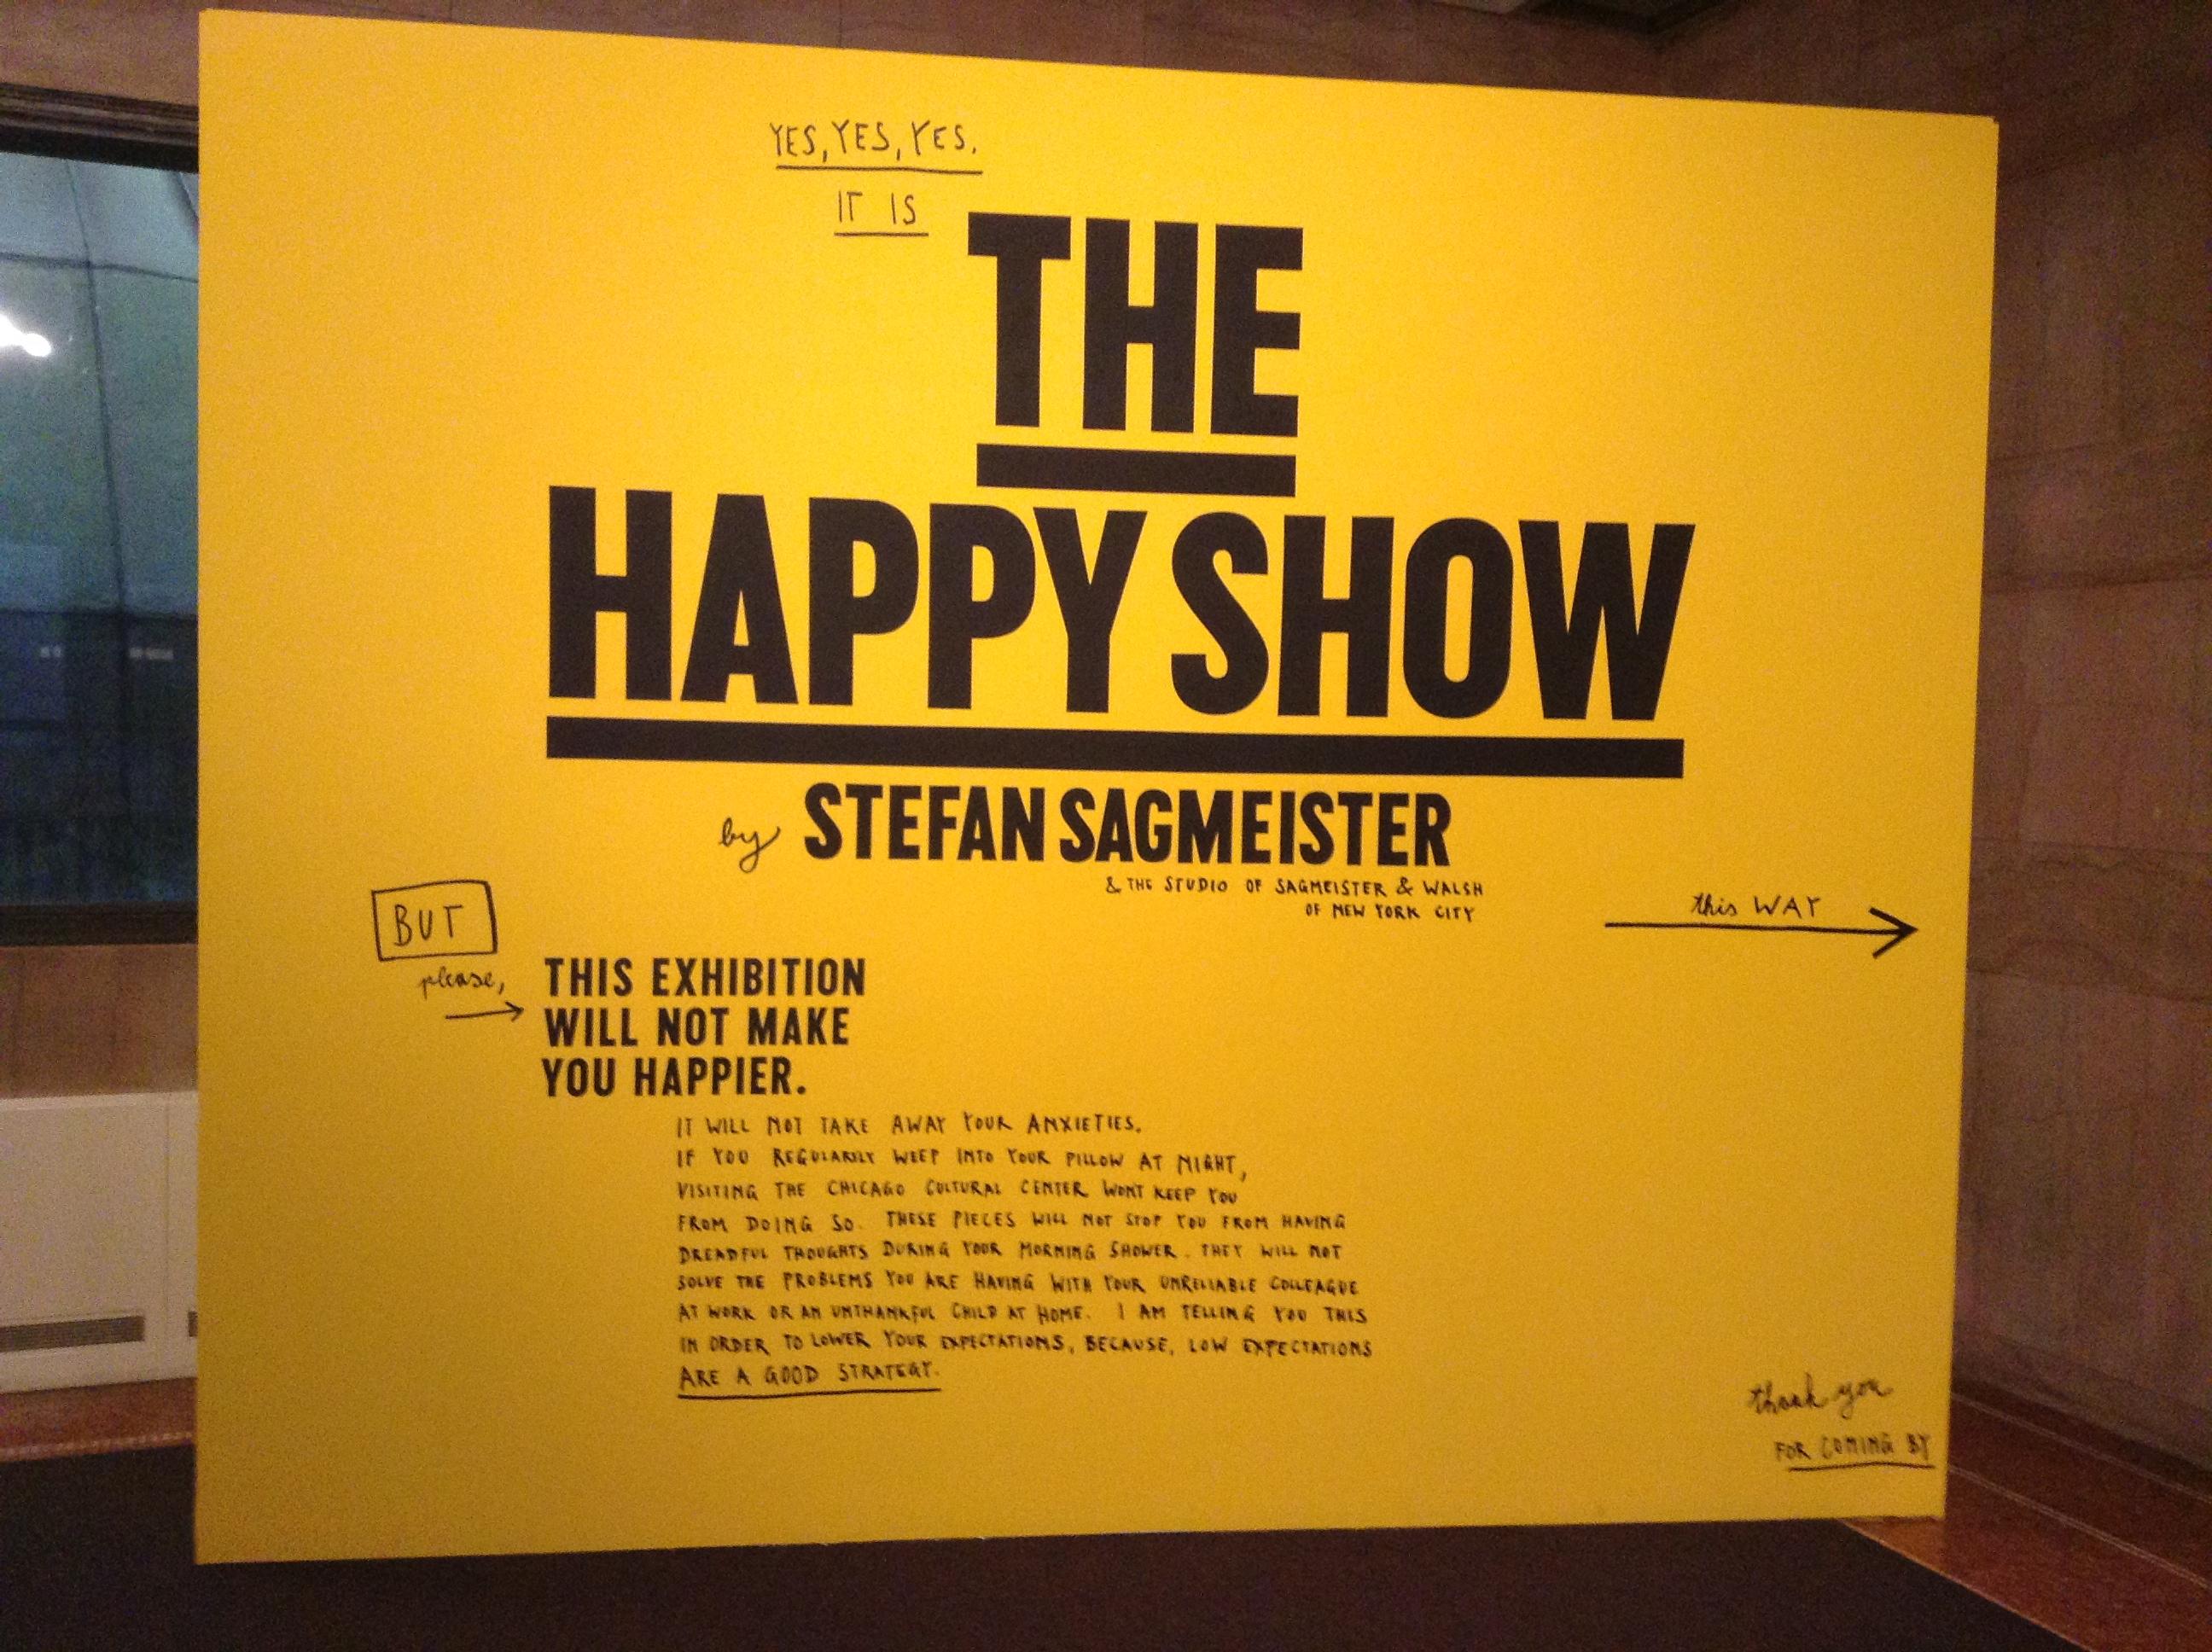 Stefan sagmeister work